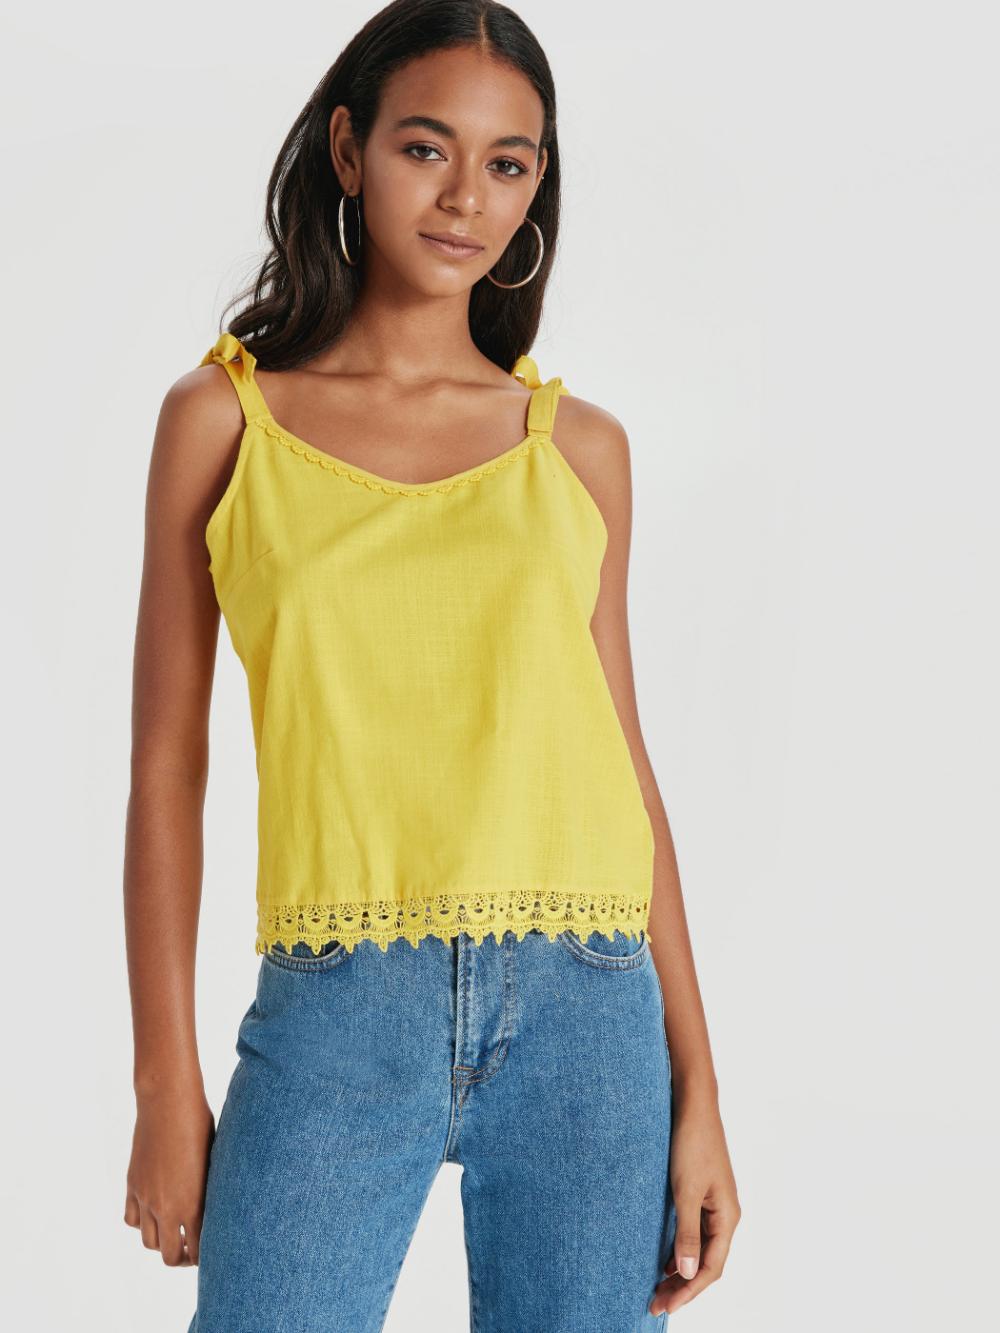 تاپ زرد زنانه Fashion Women S Top Tops